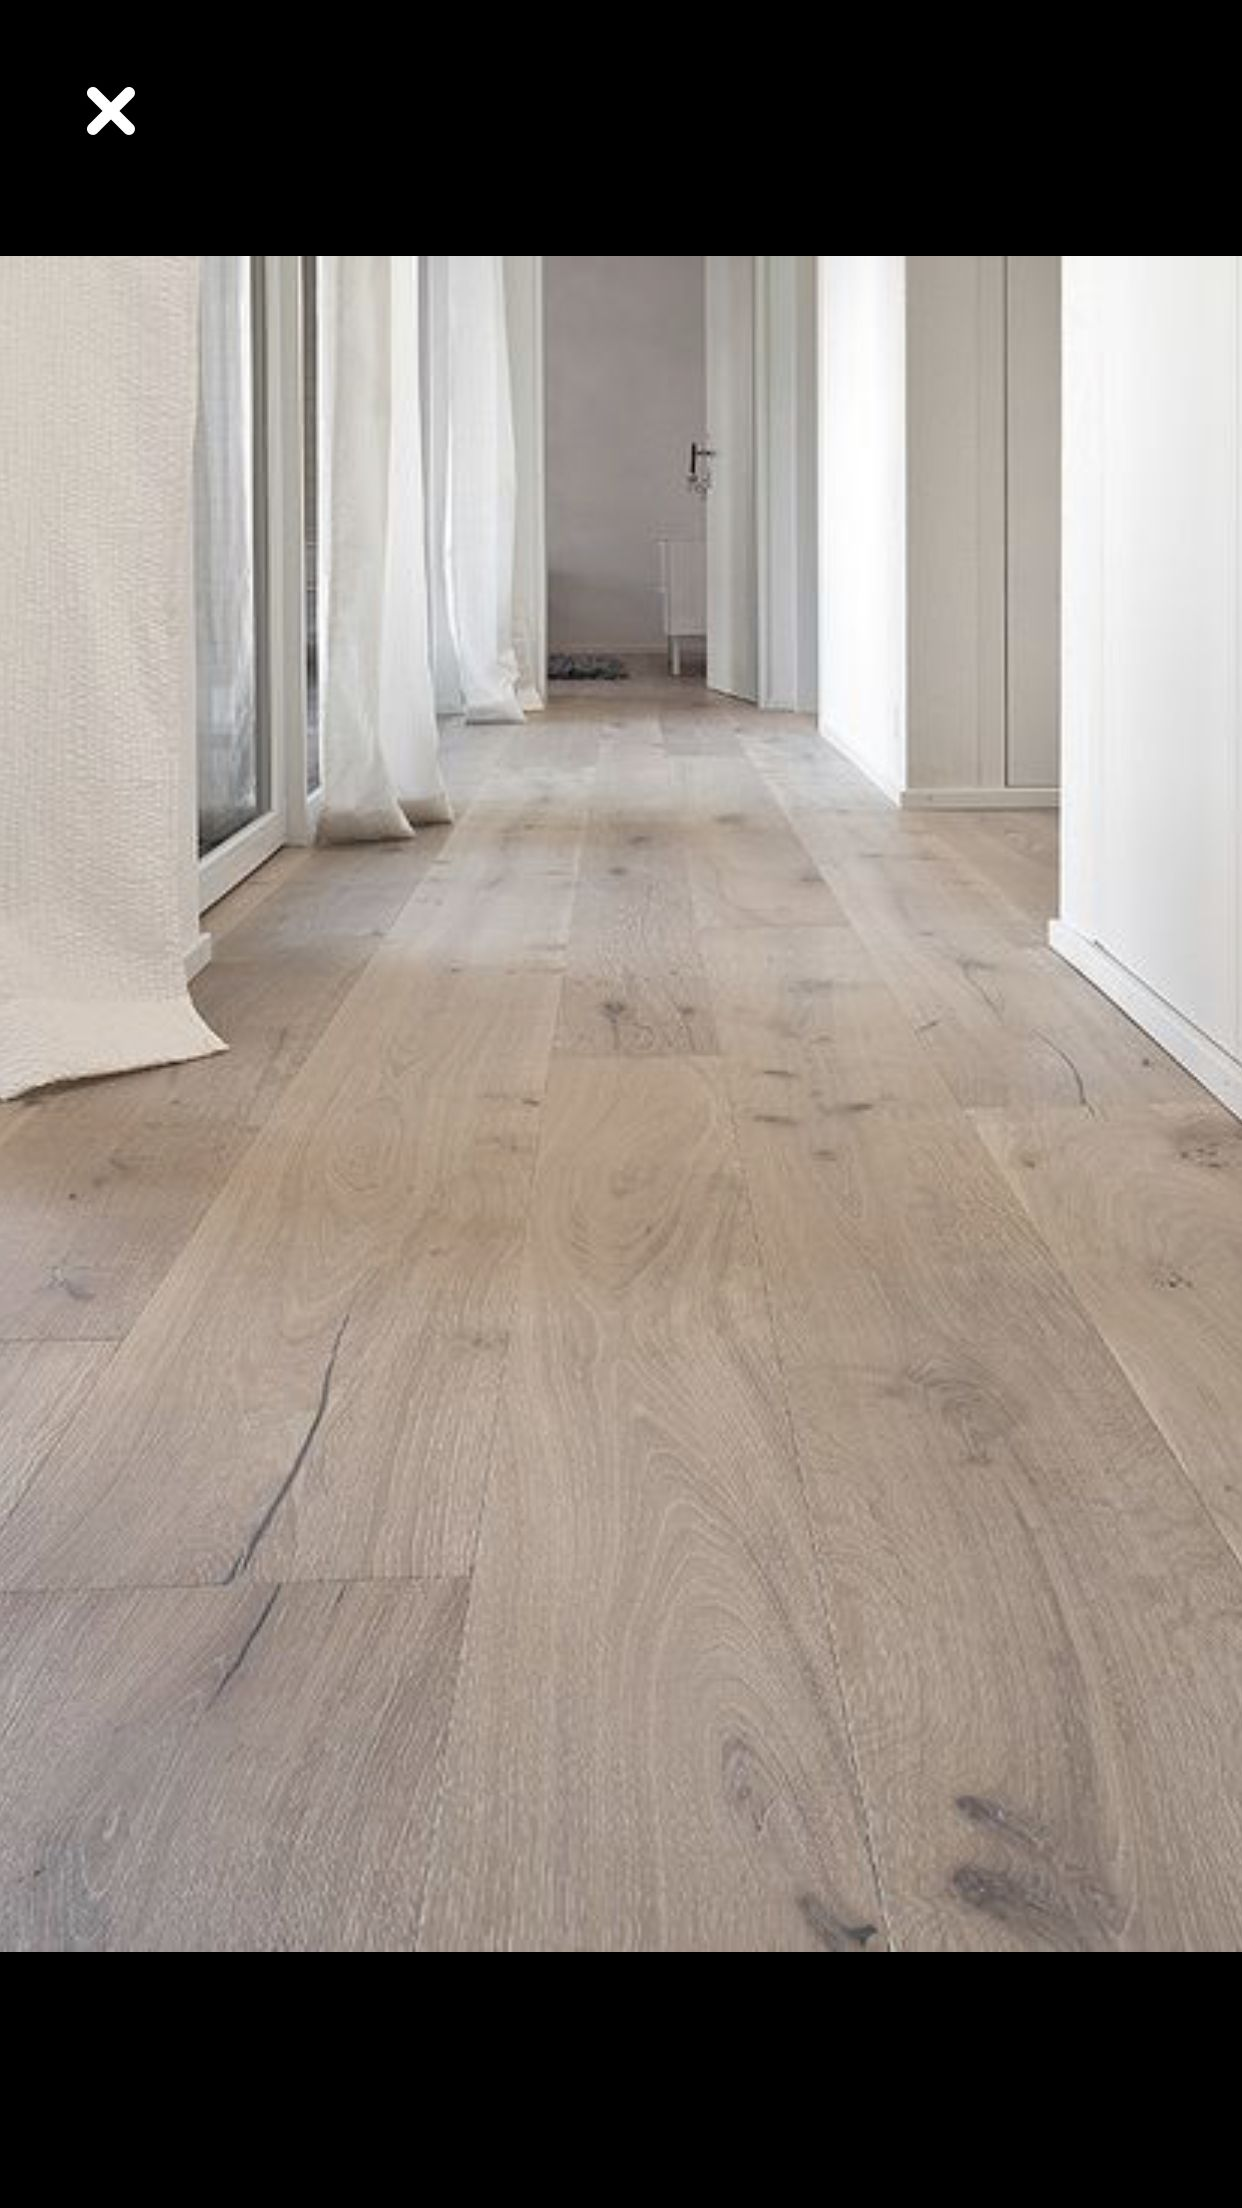 Podloga Hardwood Floor Colors Wood Floors Wide Plank House